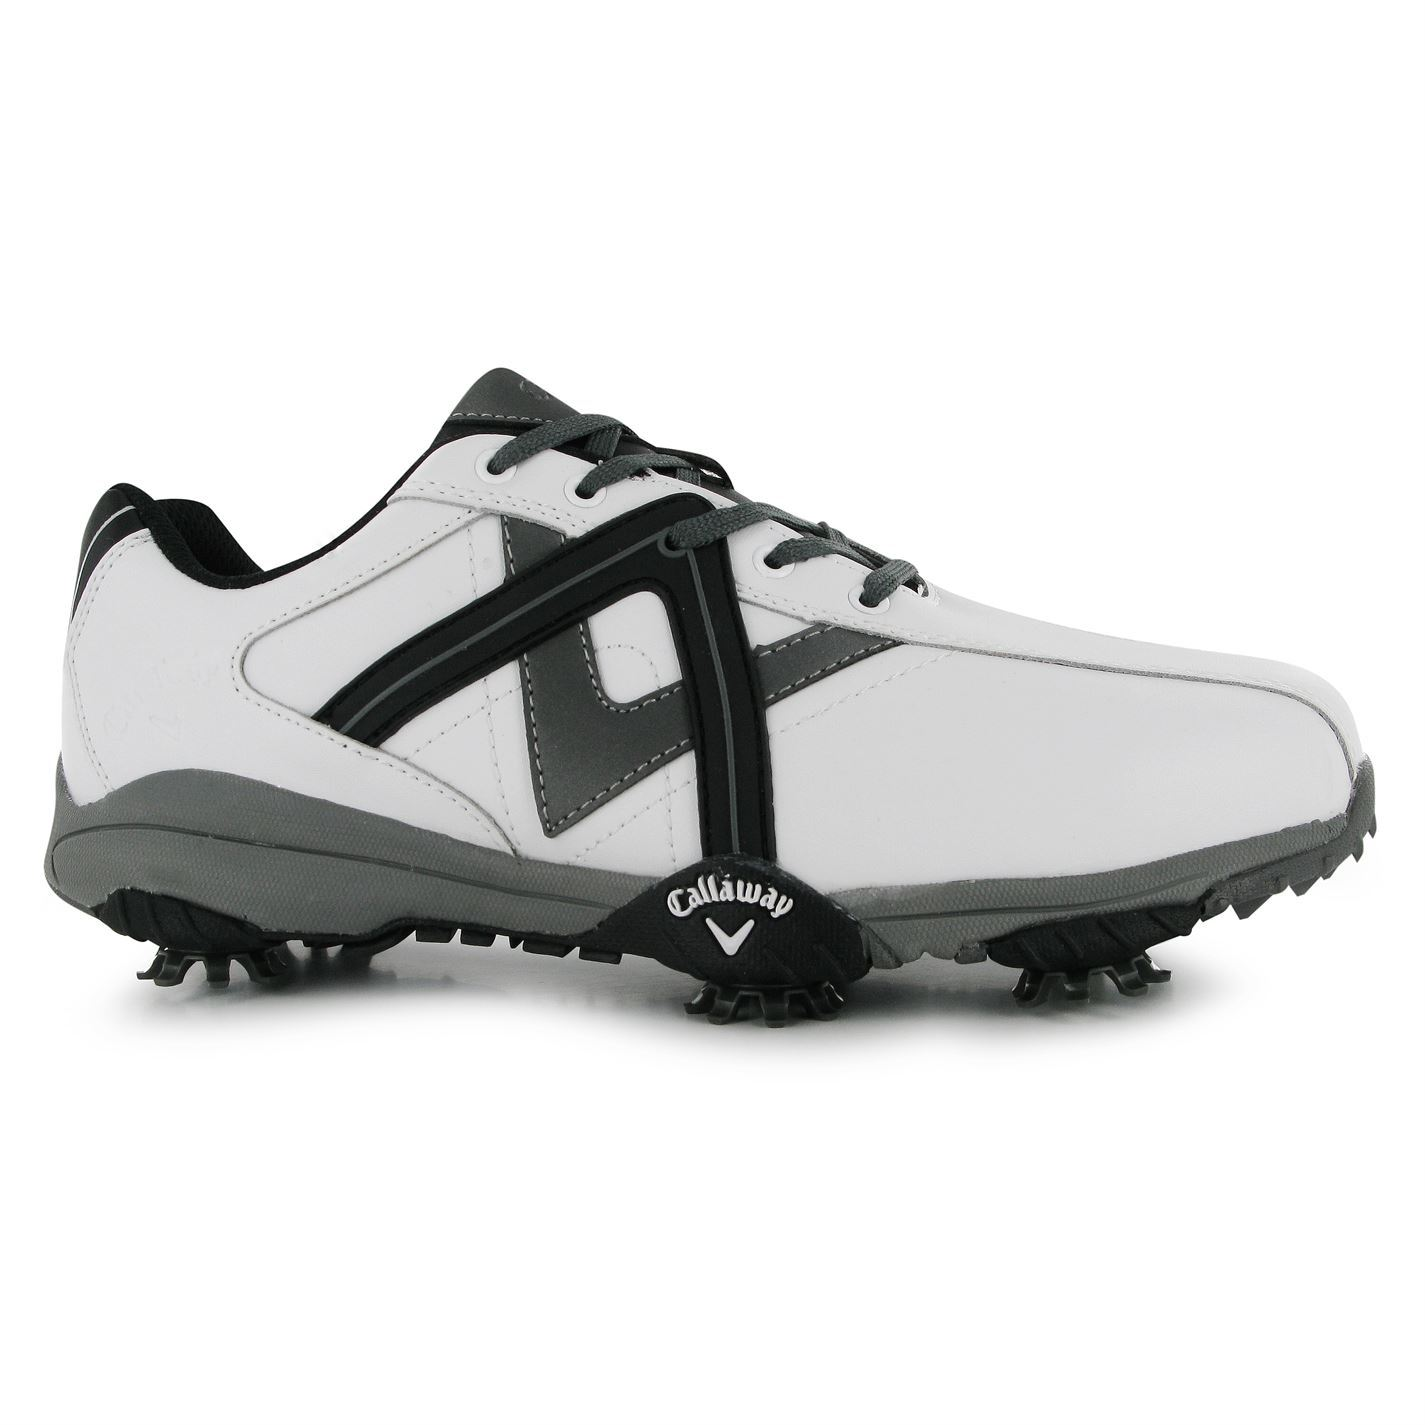 Callaway-Cheviot-ll-Golf-Shoes-Mens-Spikes-Footwear thumbnail 13